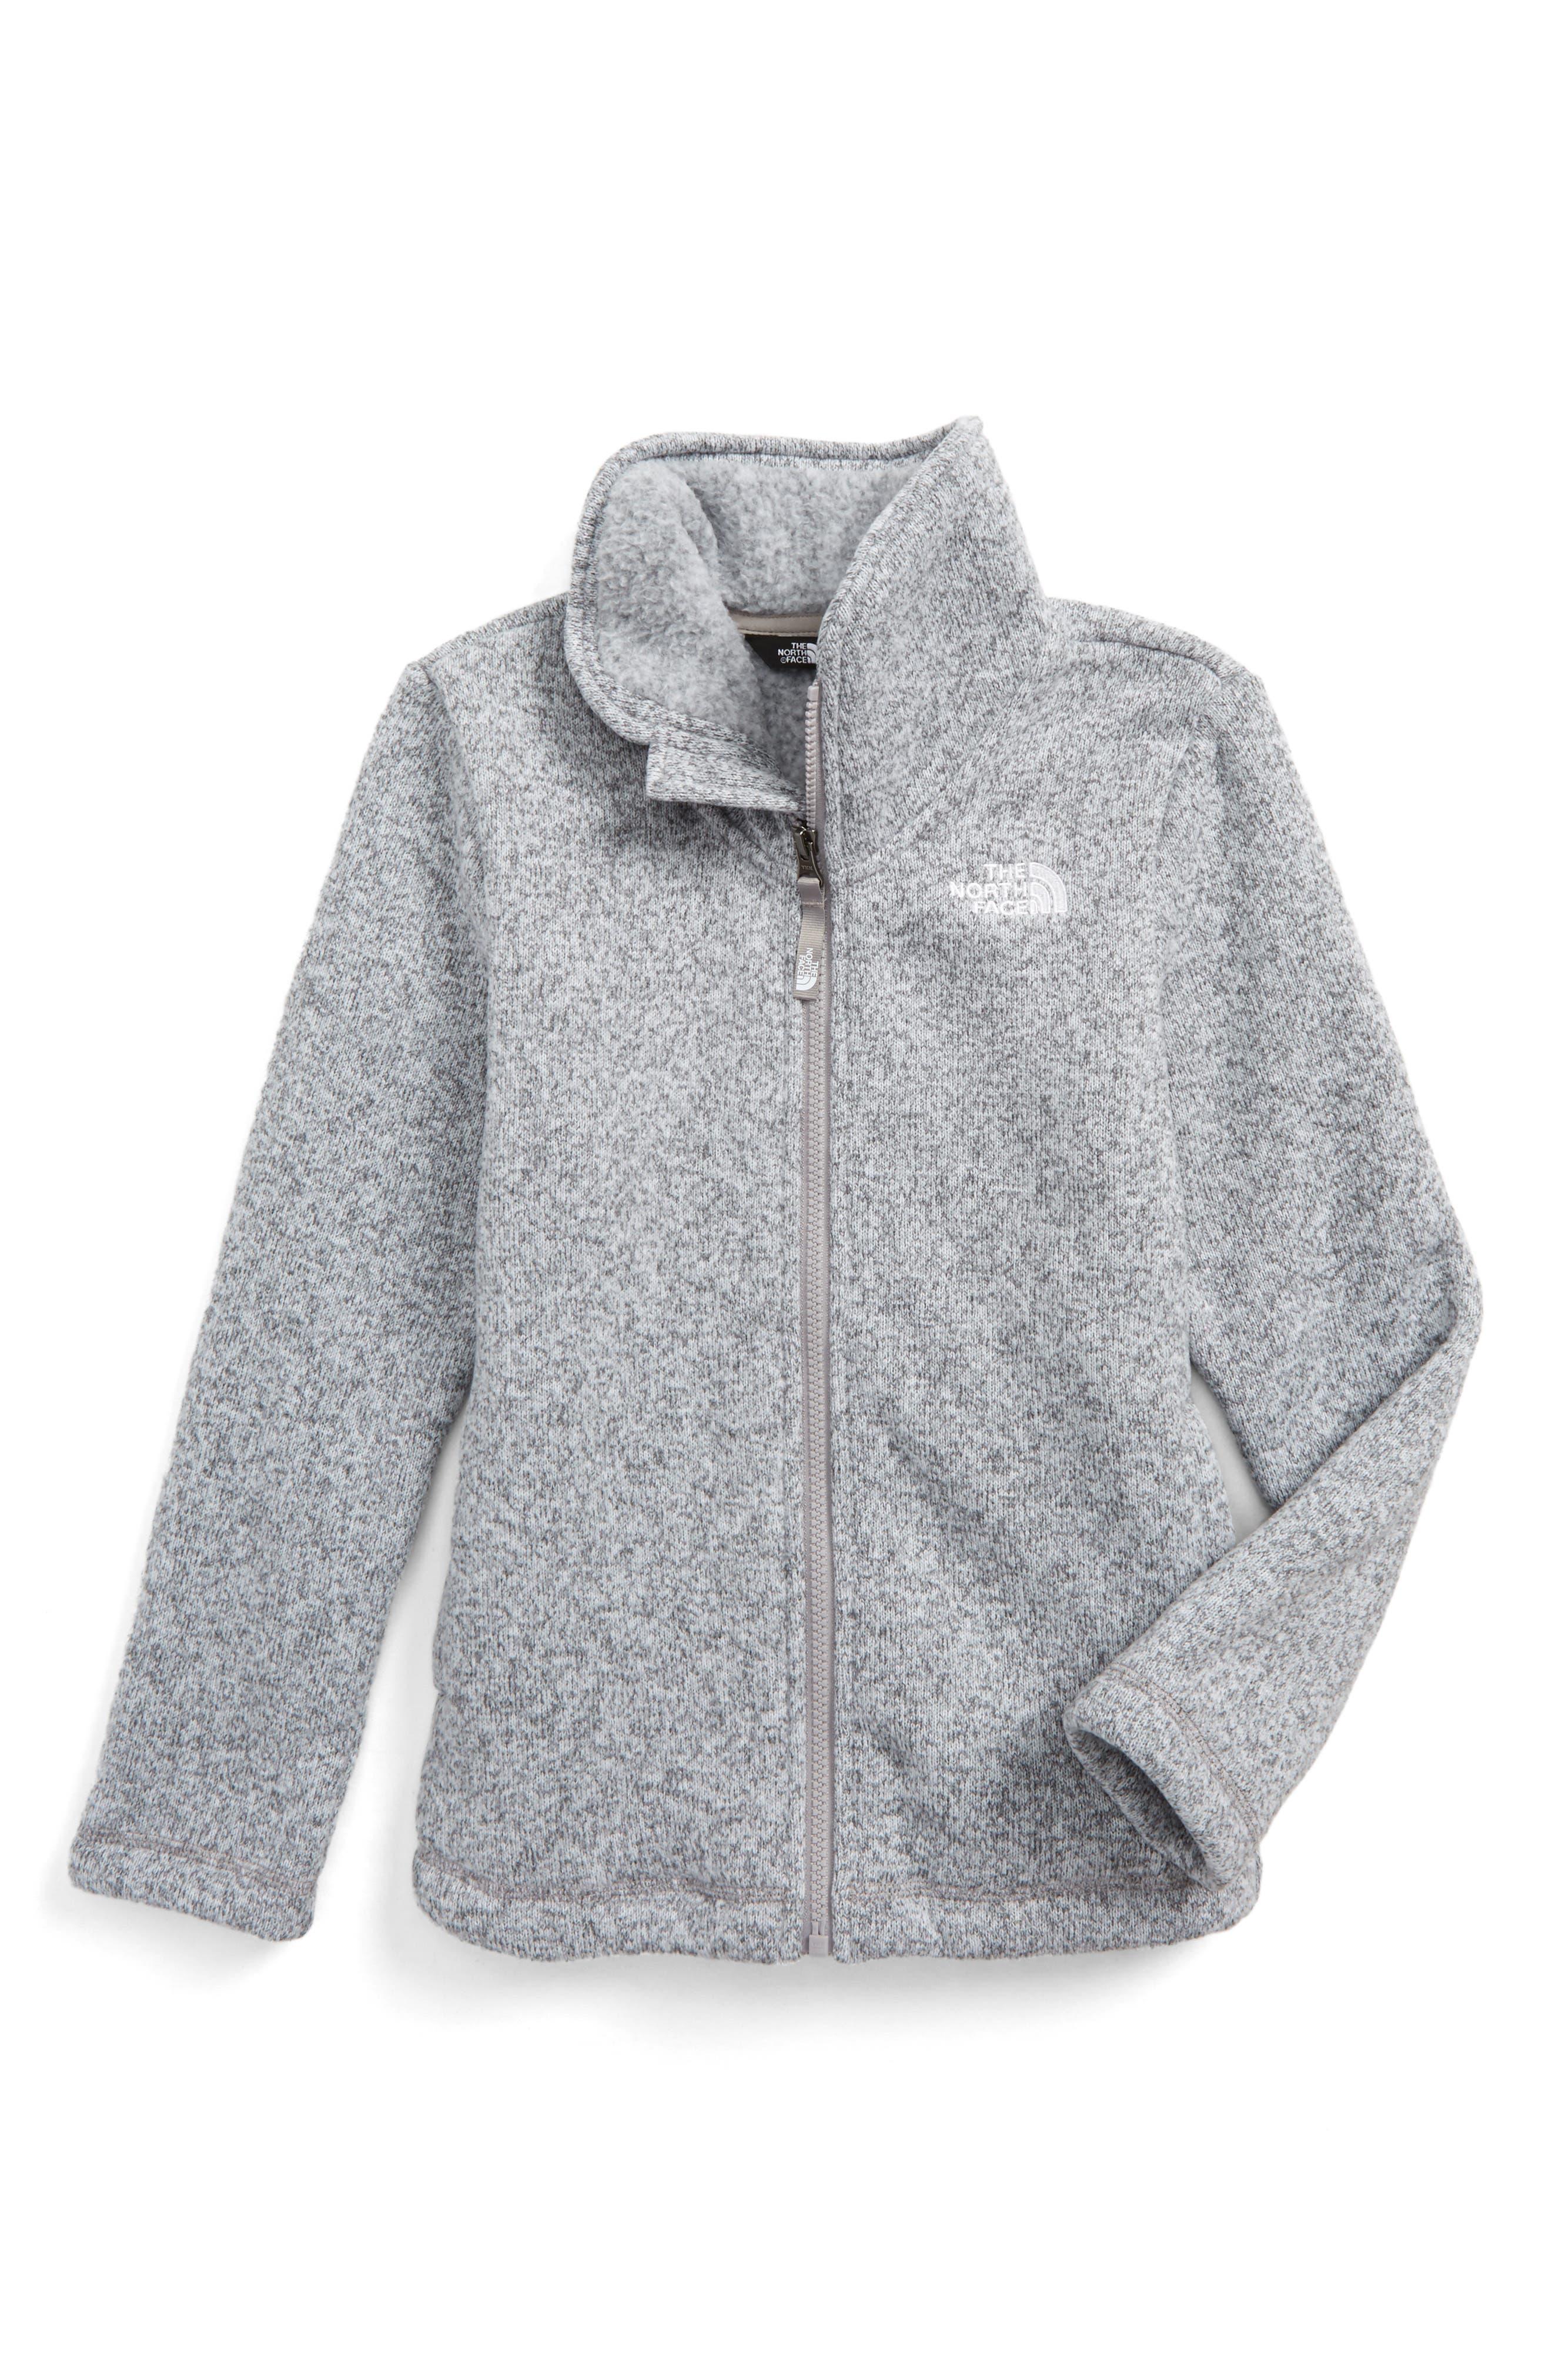 Crescent Fleece Jacket,                         Main,                         color, 050